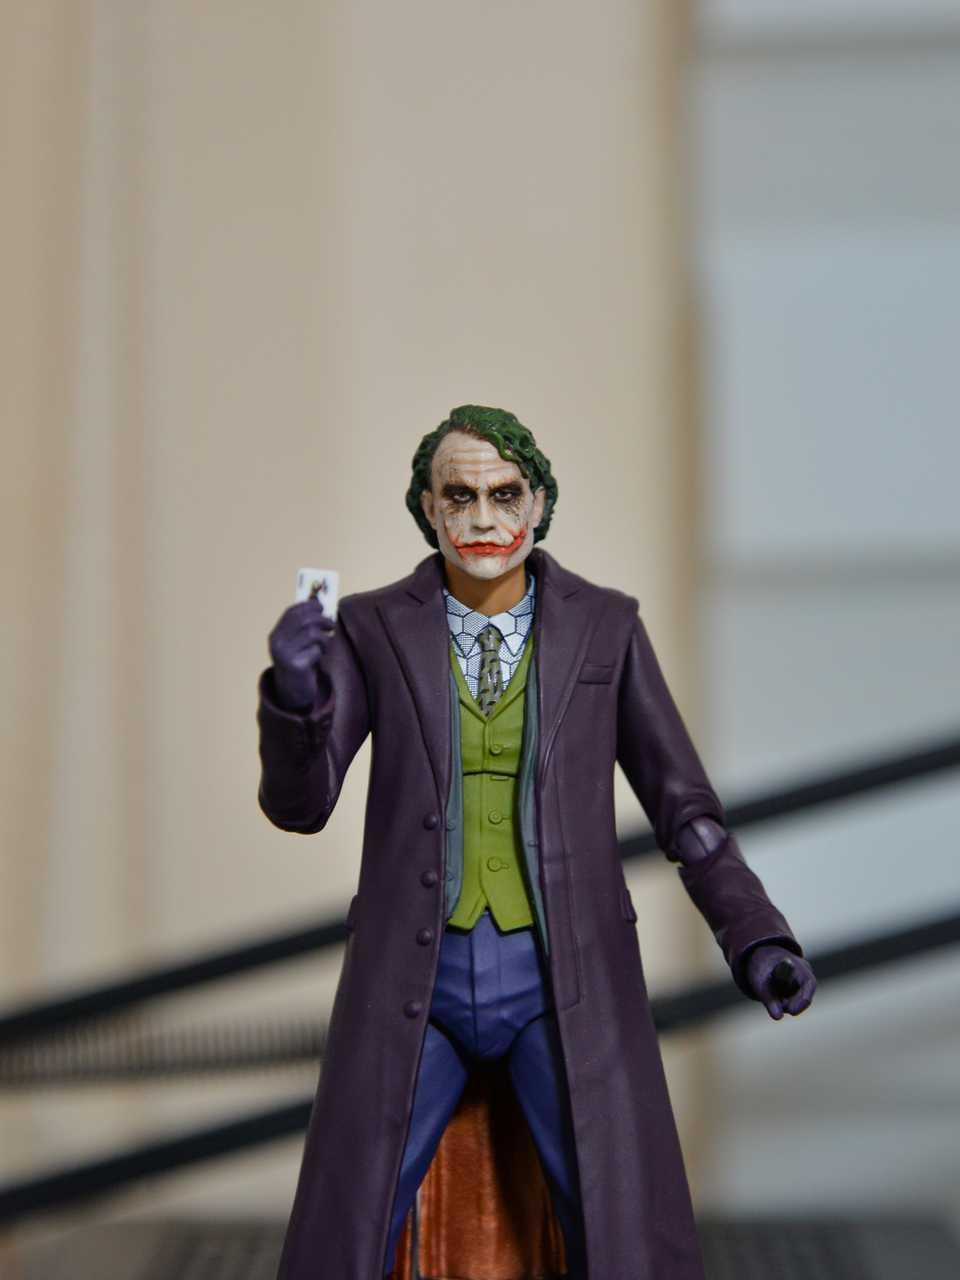 Six Inch DIY Joker